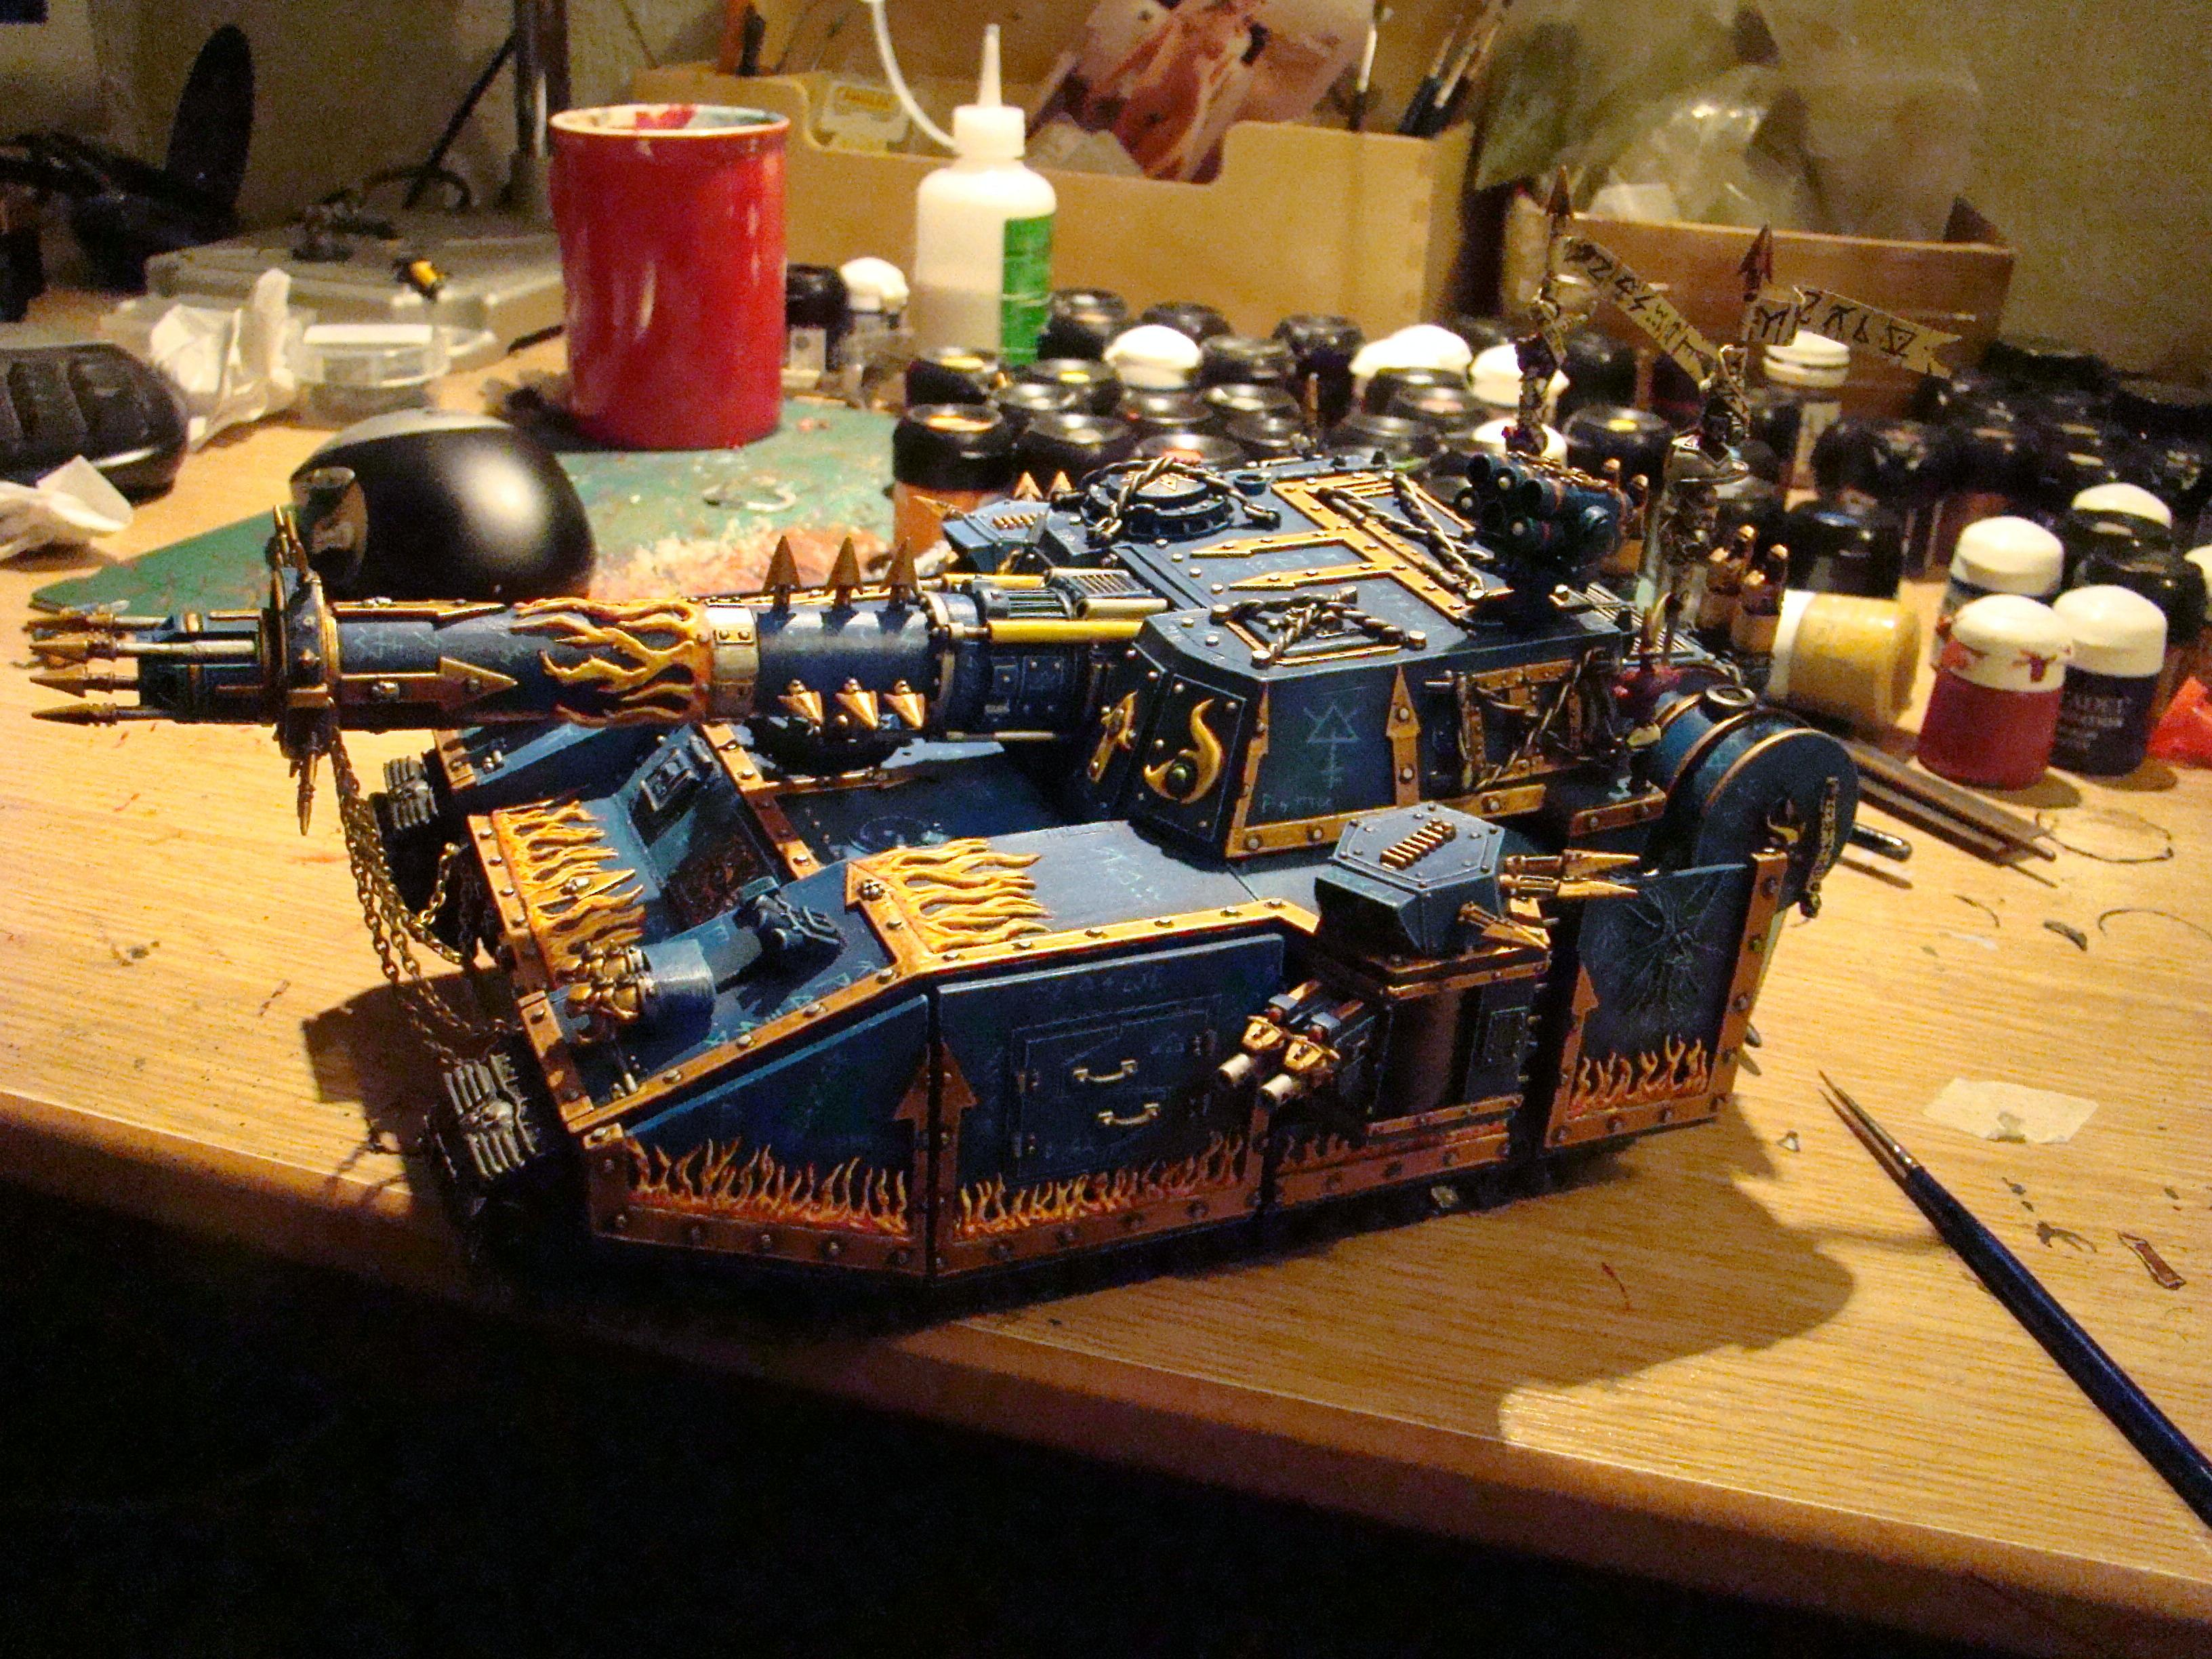 Baneblade, Chaos, Chaos Space Marines, Thousand Sons, Tzeentch, Warhammer 40,000